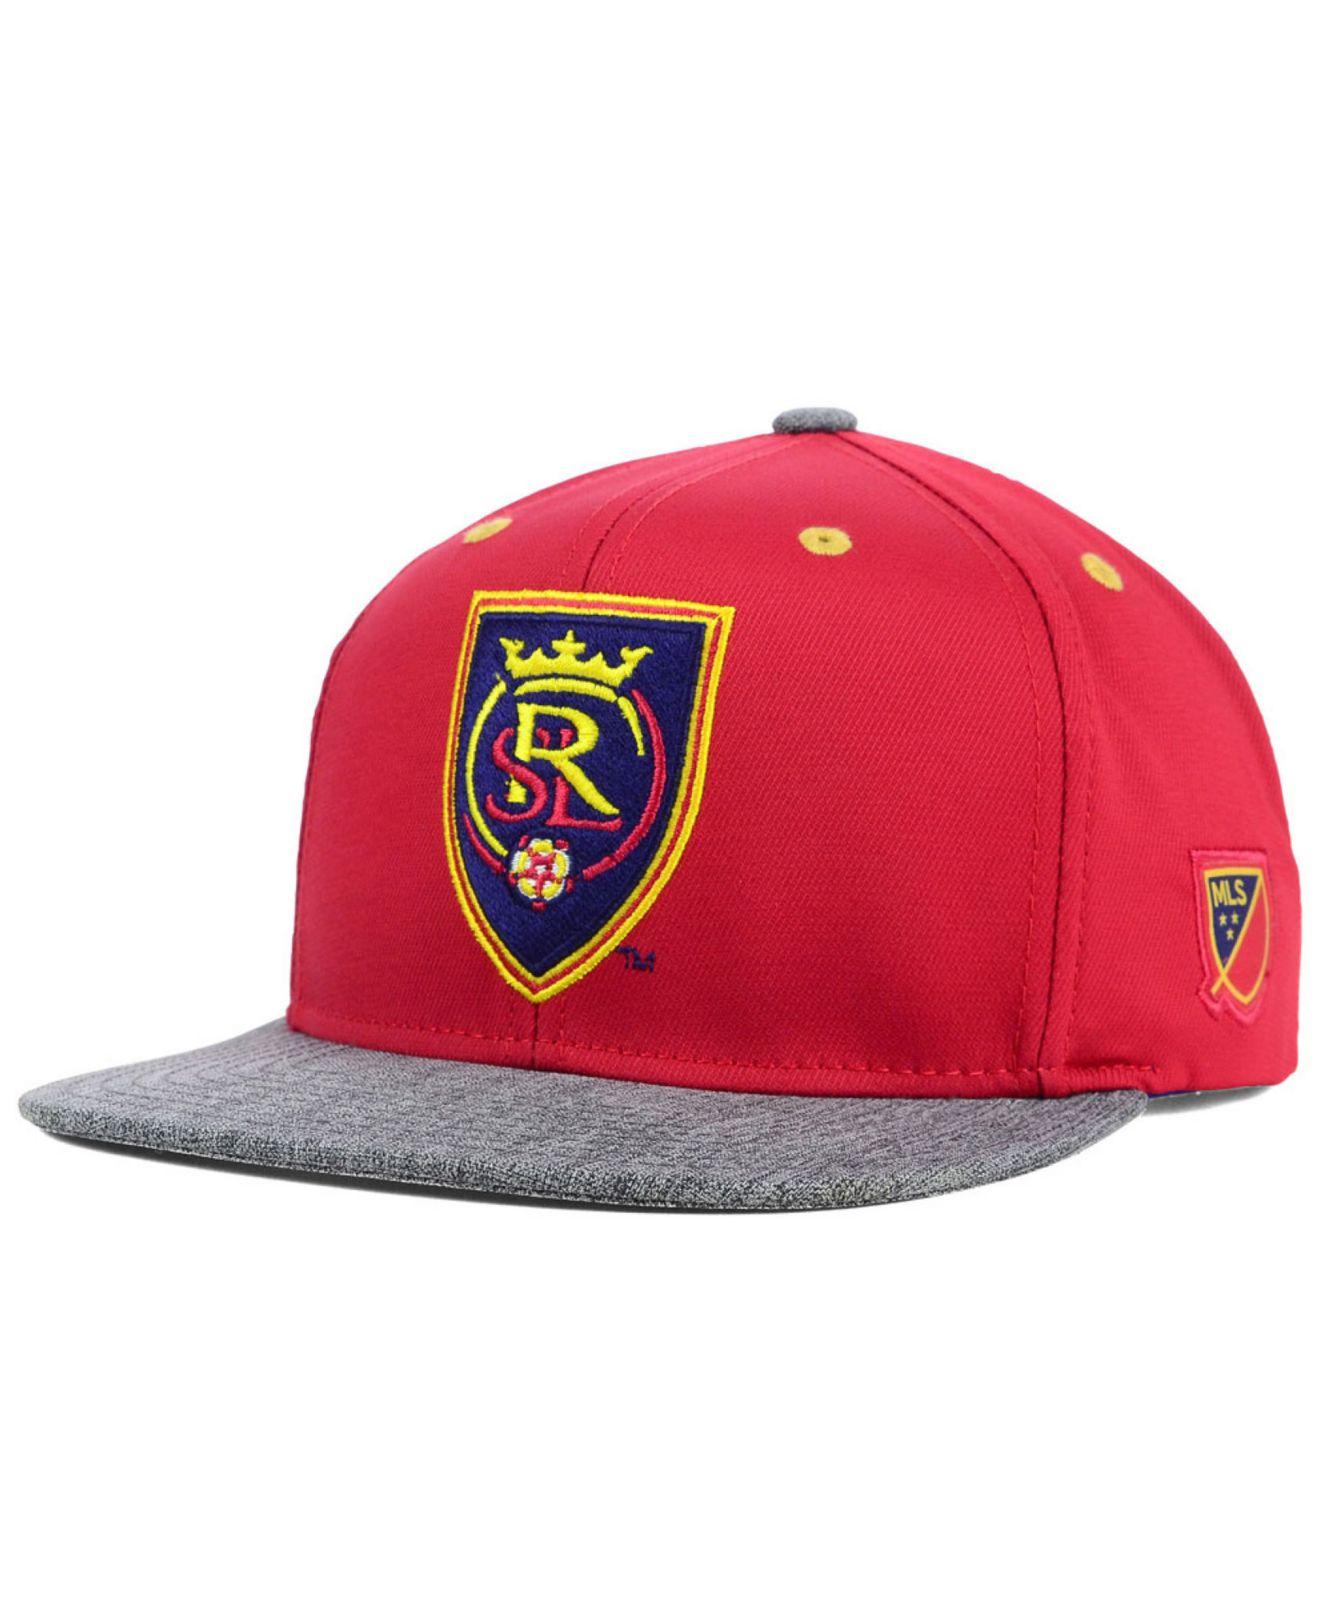 a058839d48c Lyst - adidas Real Salt Lake Team Snapback Cap in Purple for Men